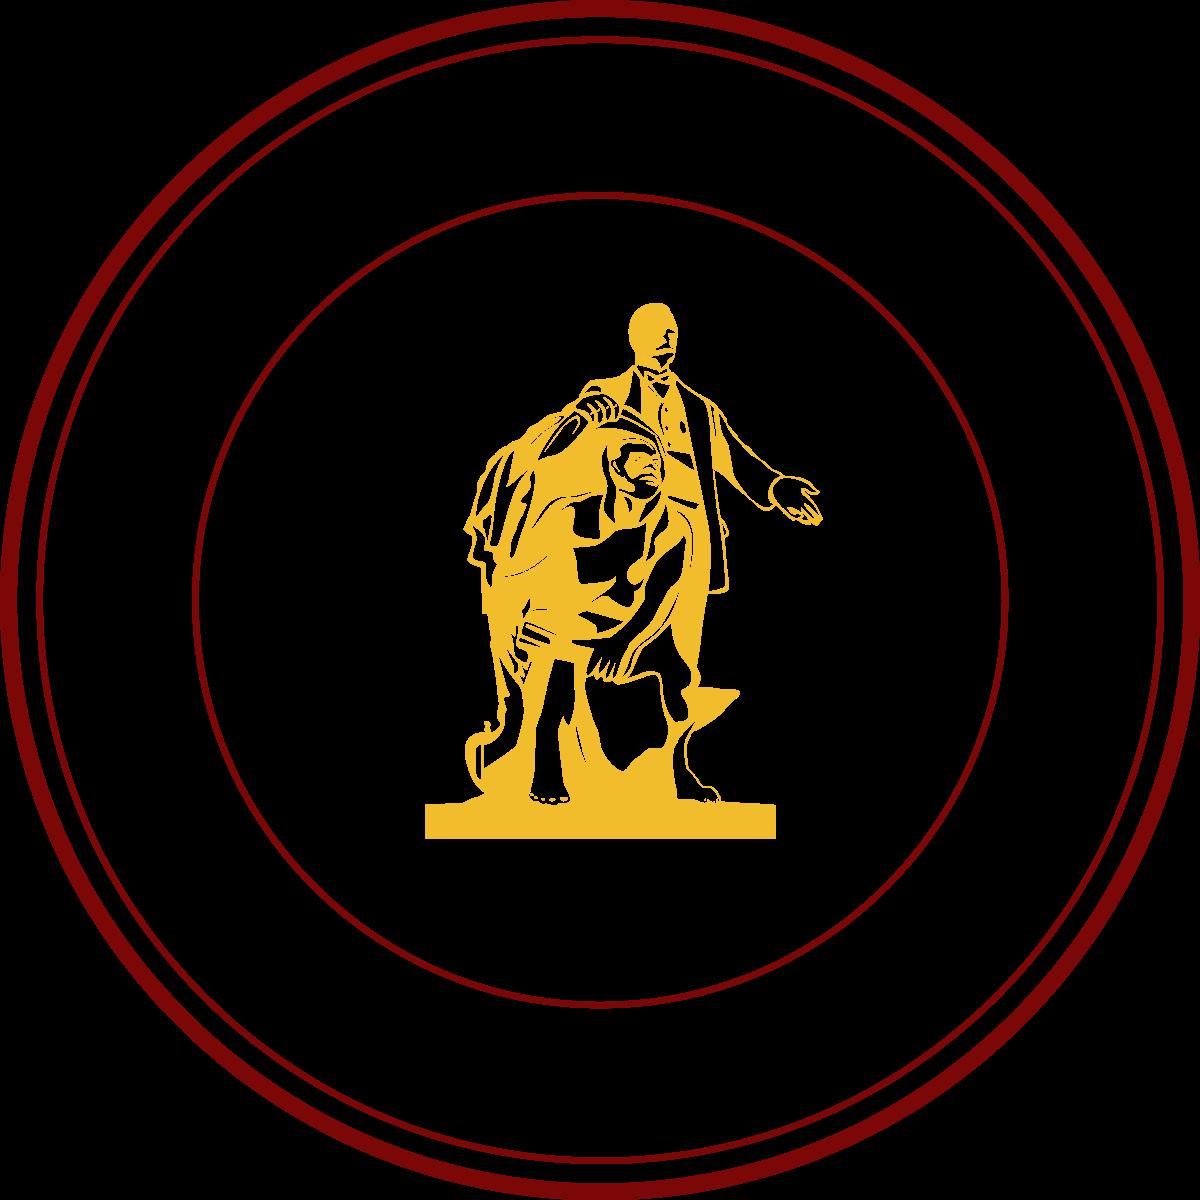 University of alabama integration clipart freeuse Tuskegee University - Wikipedia freeuse